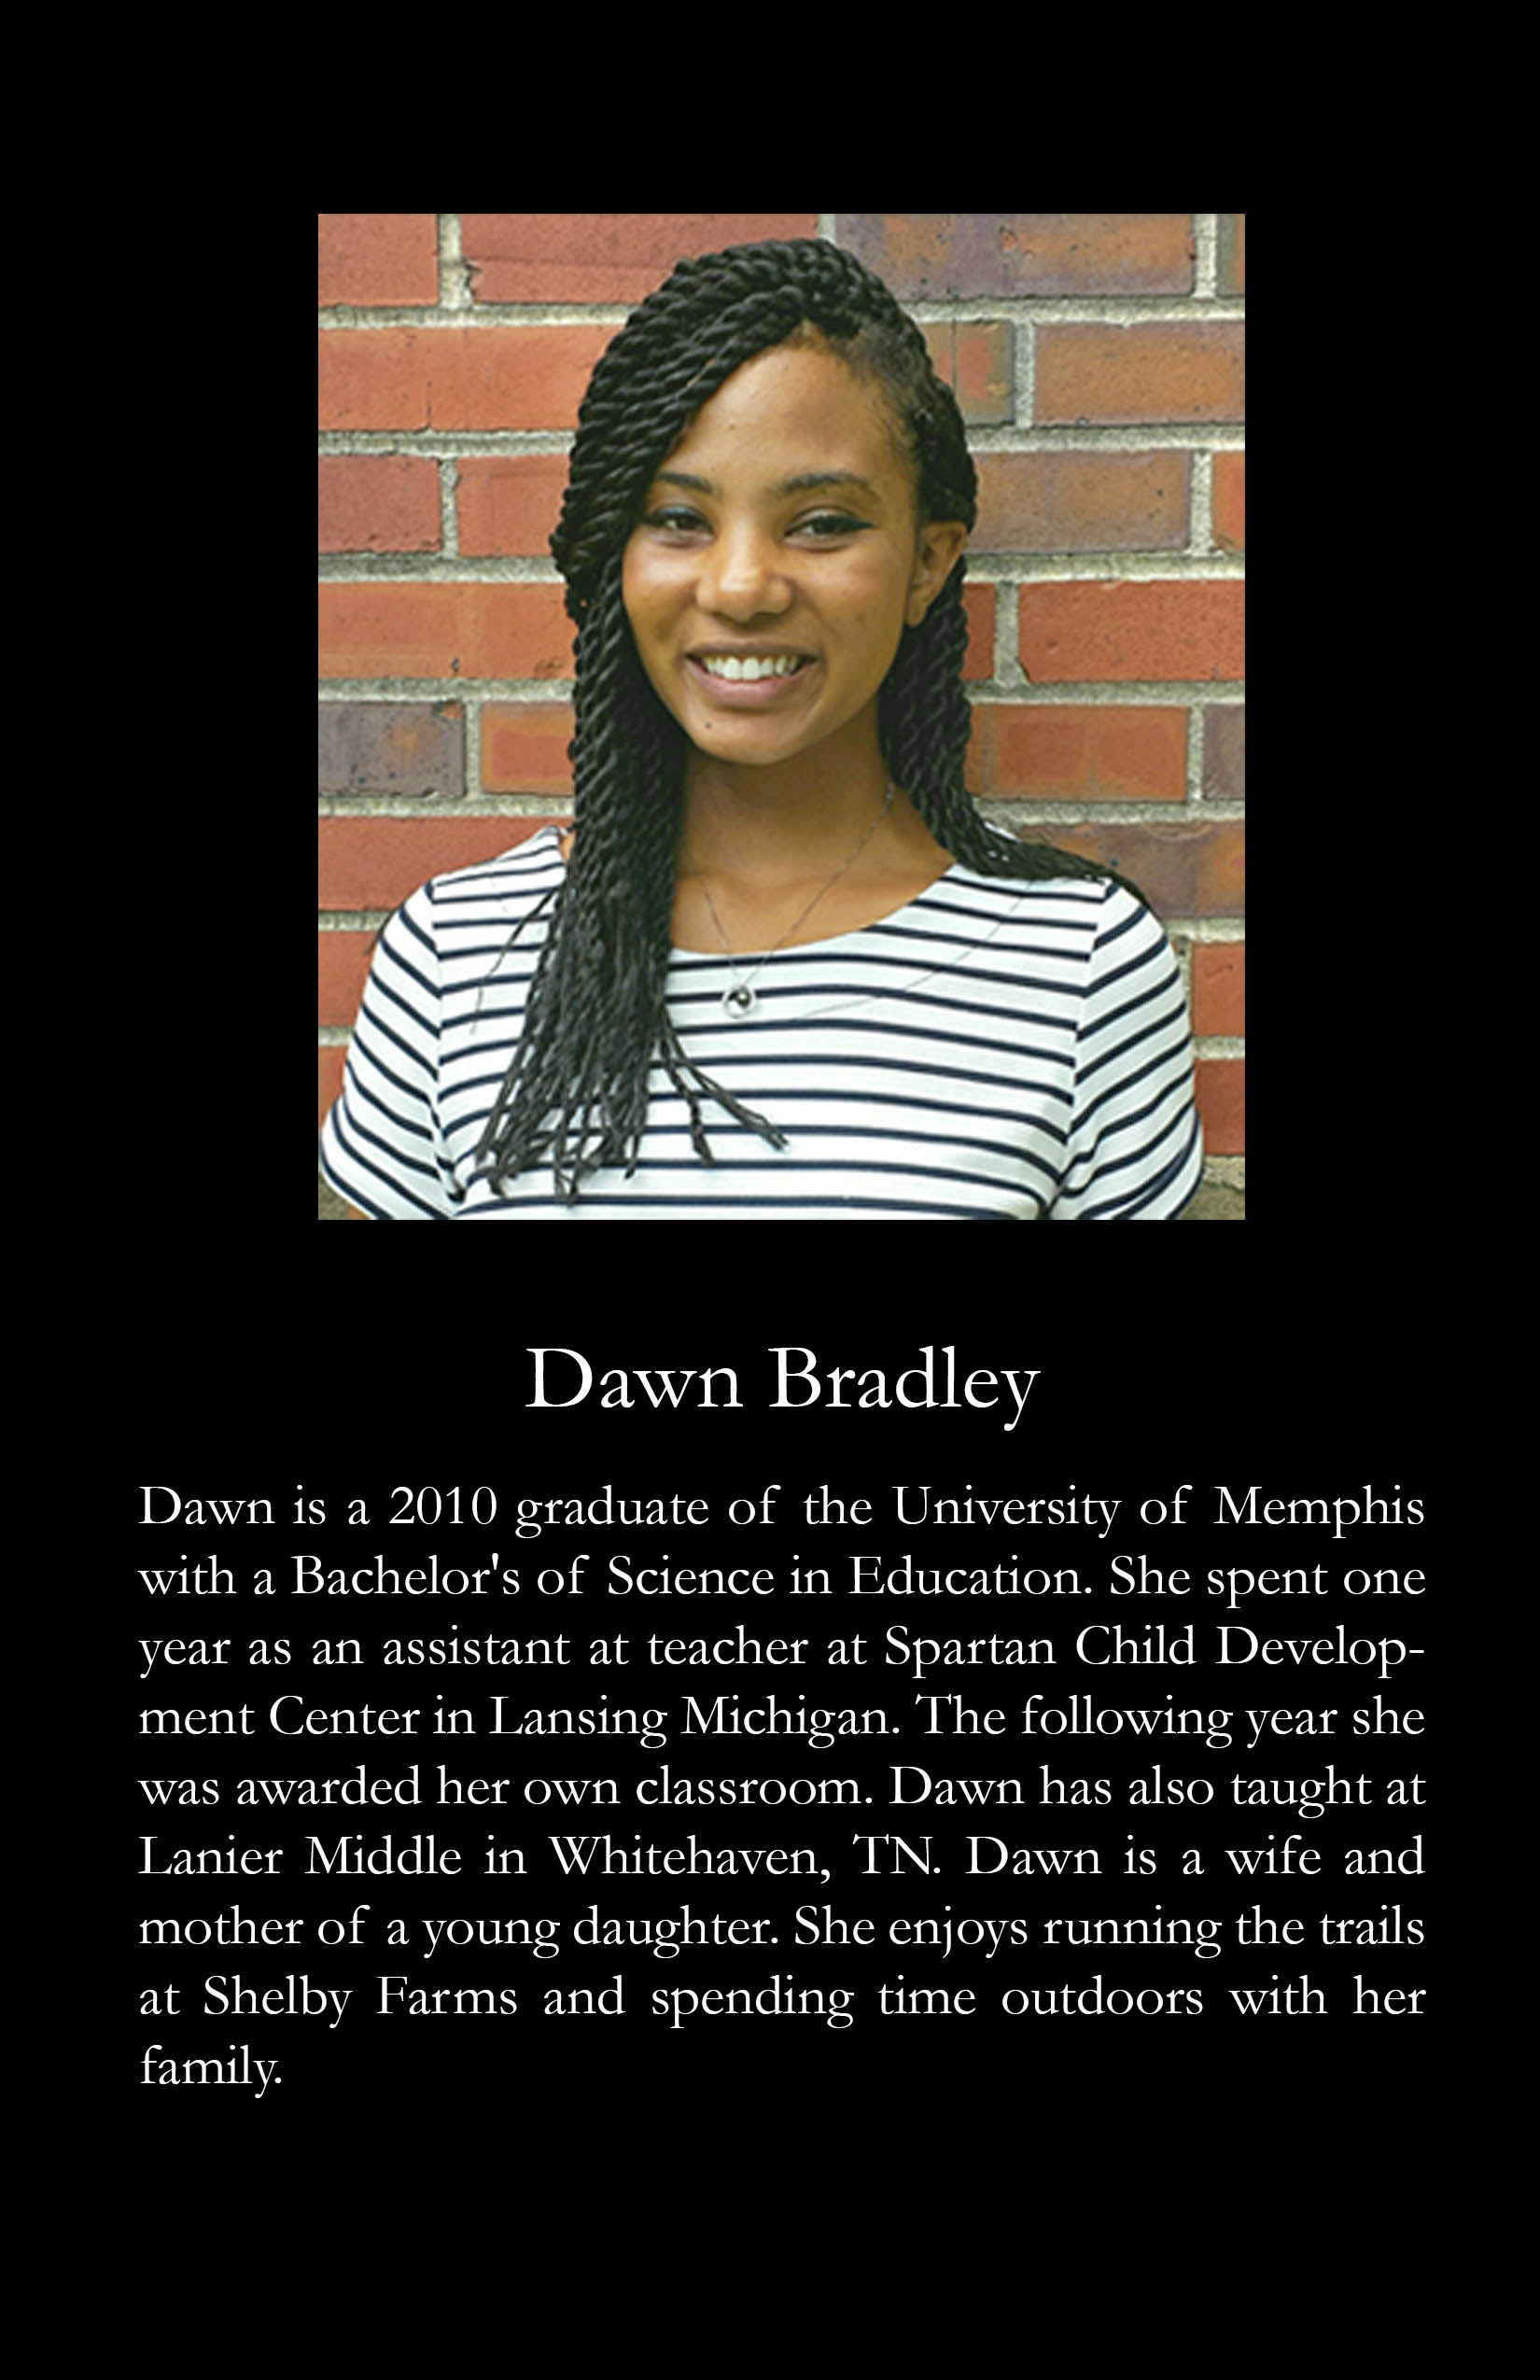 Dawn Bradley.jpg